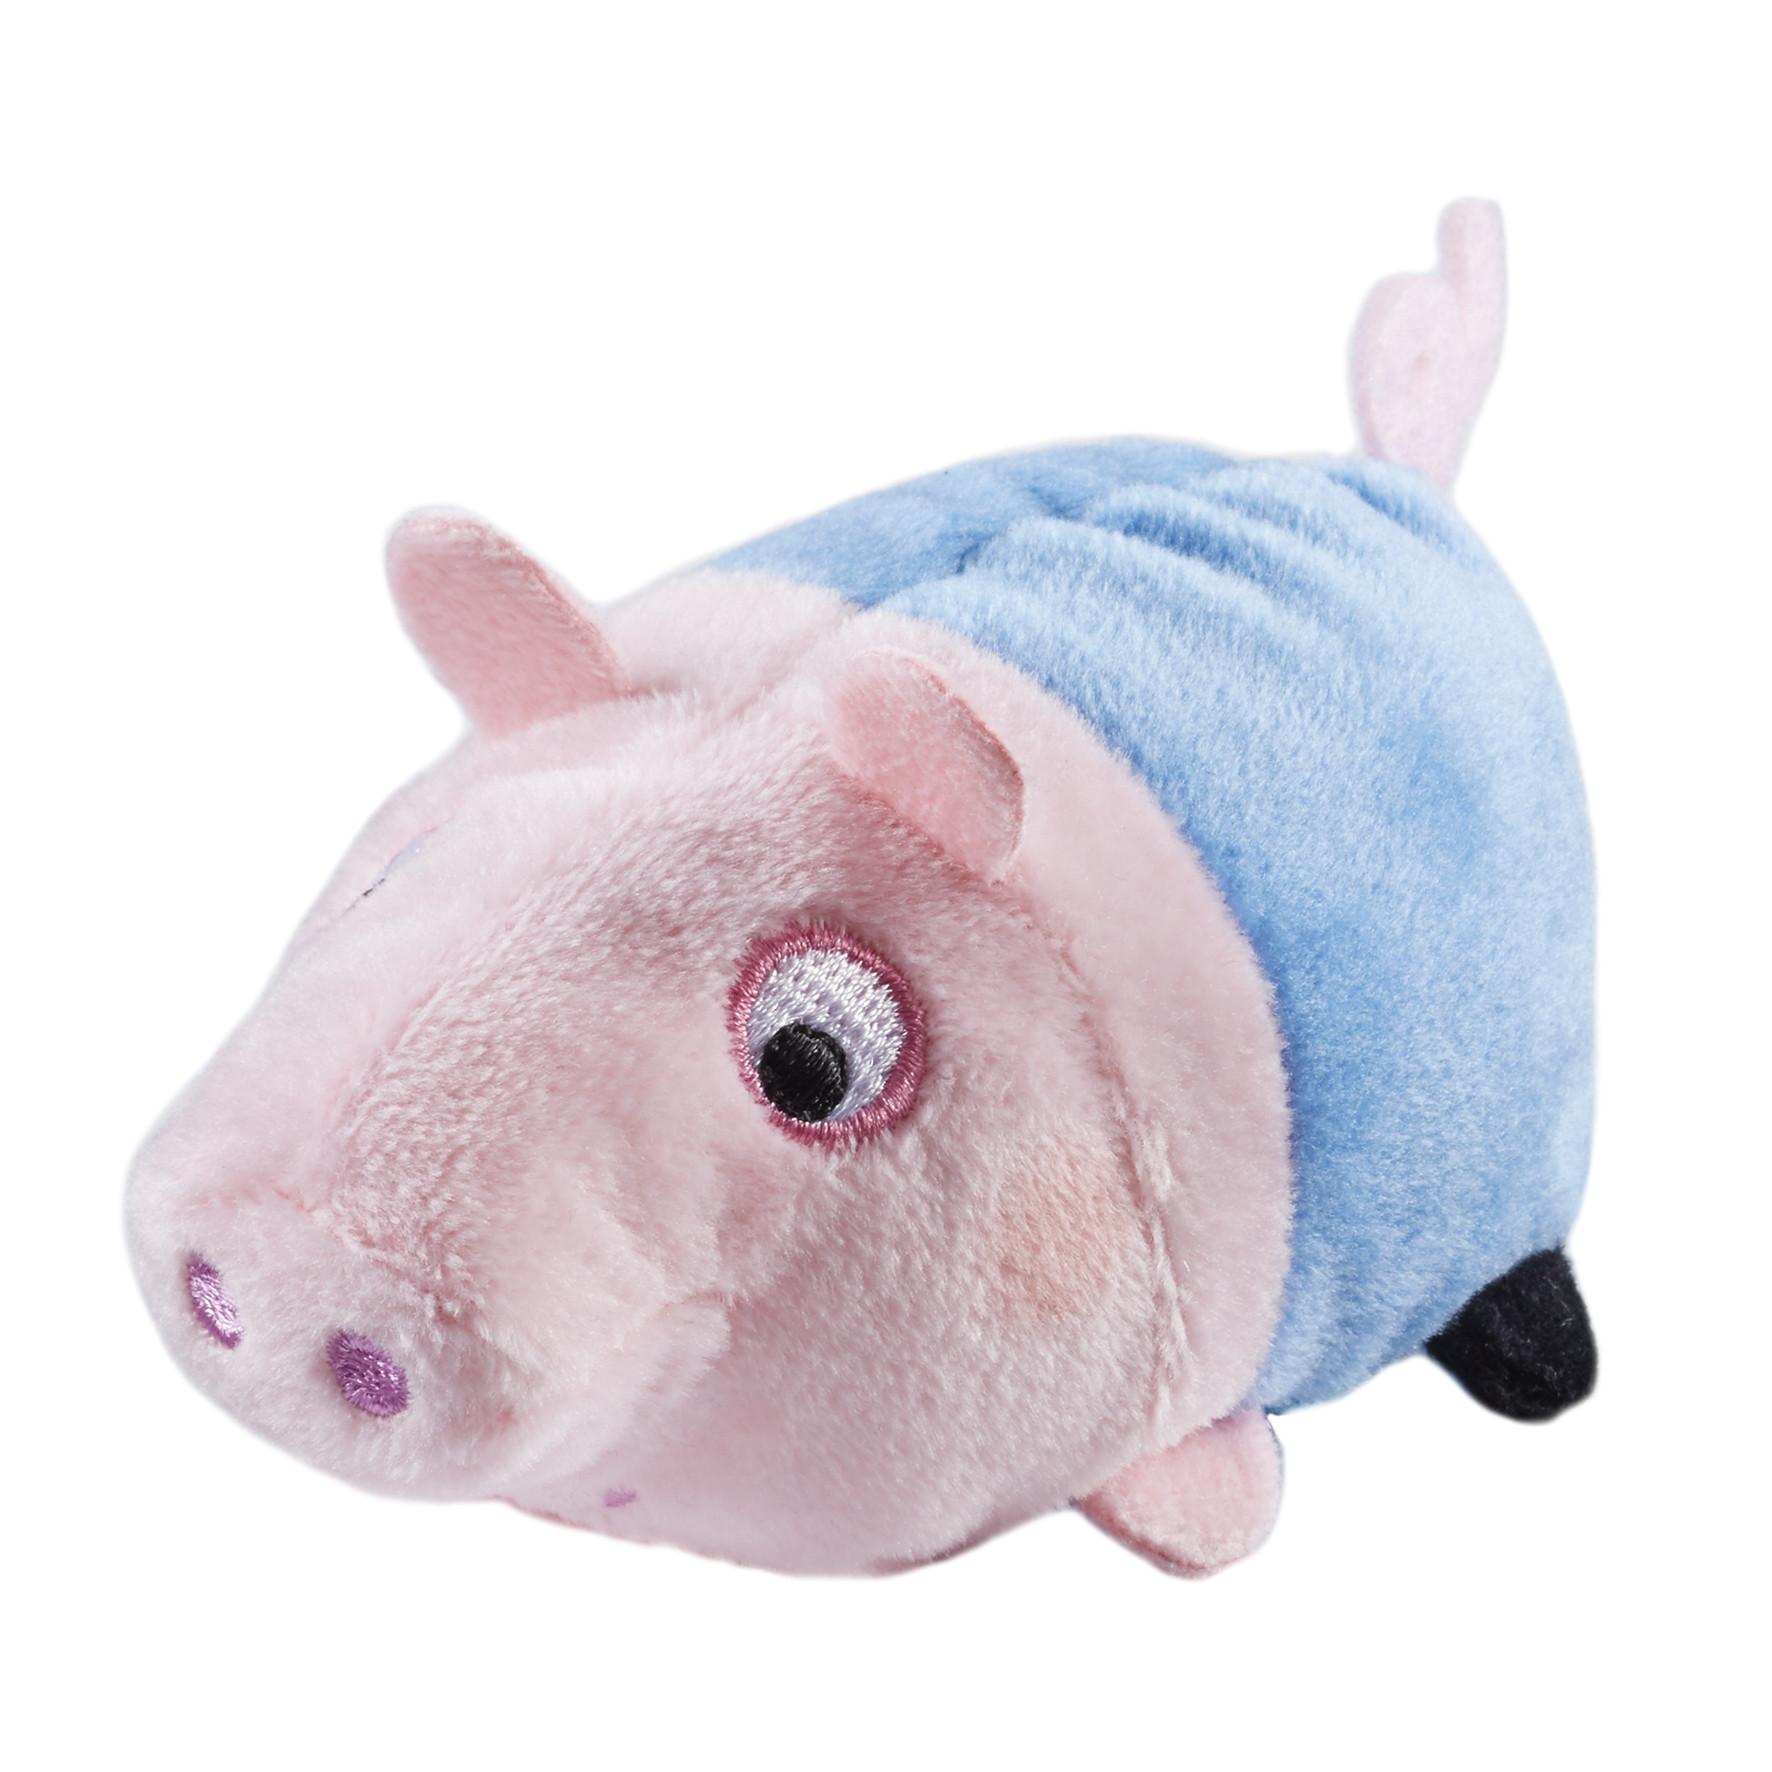 PEPPA PIG ΜΙΚΡΑ ΛΟΥΤΡΙΝΑ STACKIES (6 ΣΧΕΔΙΑ)